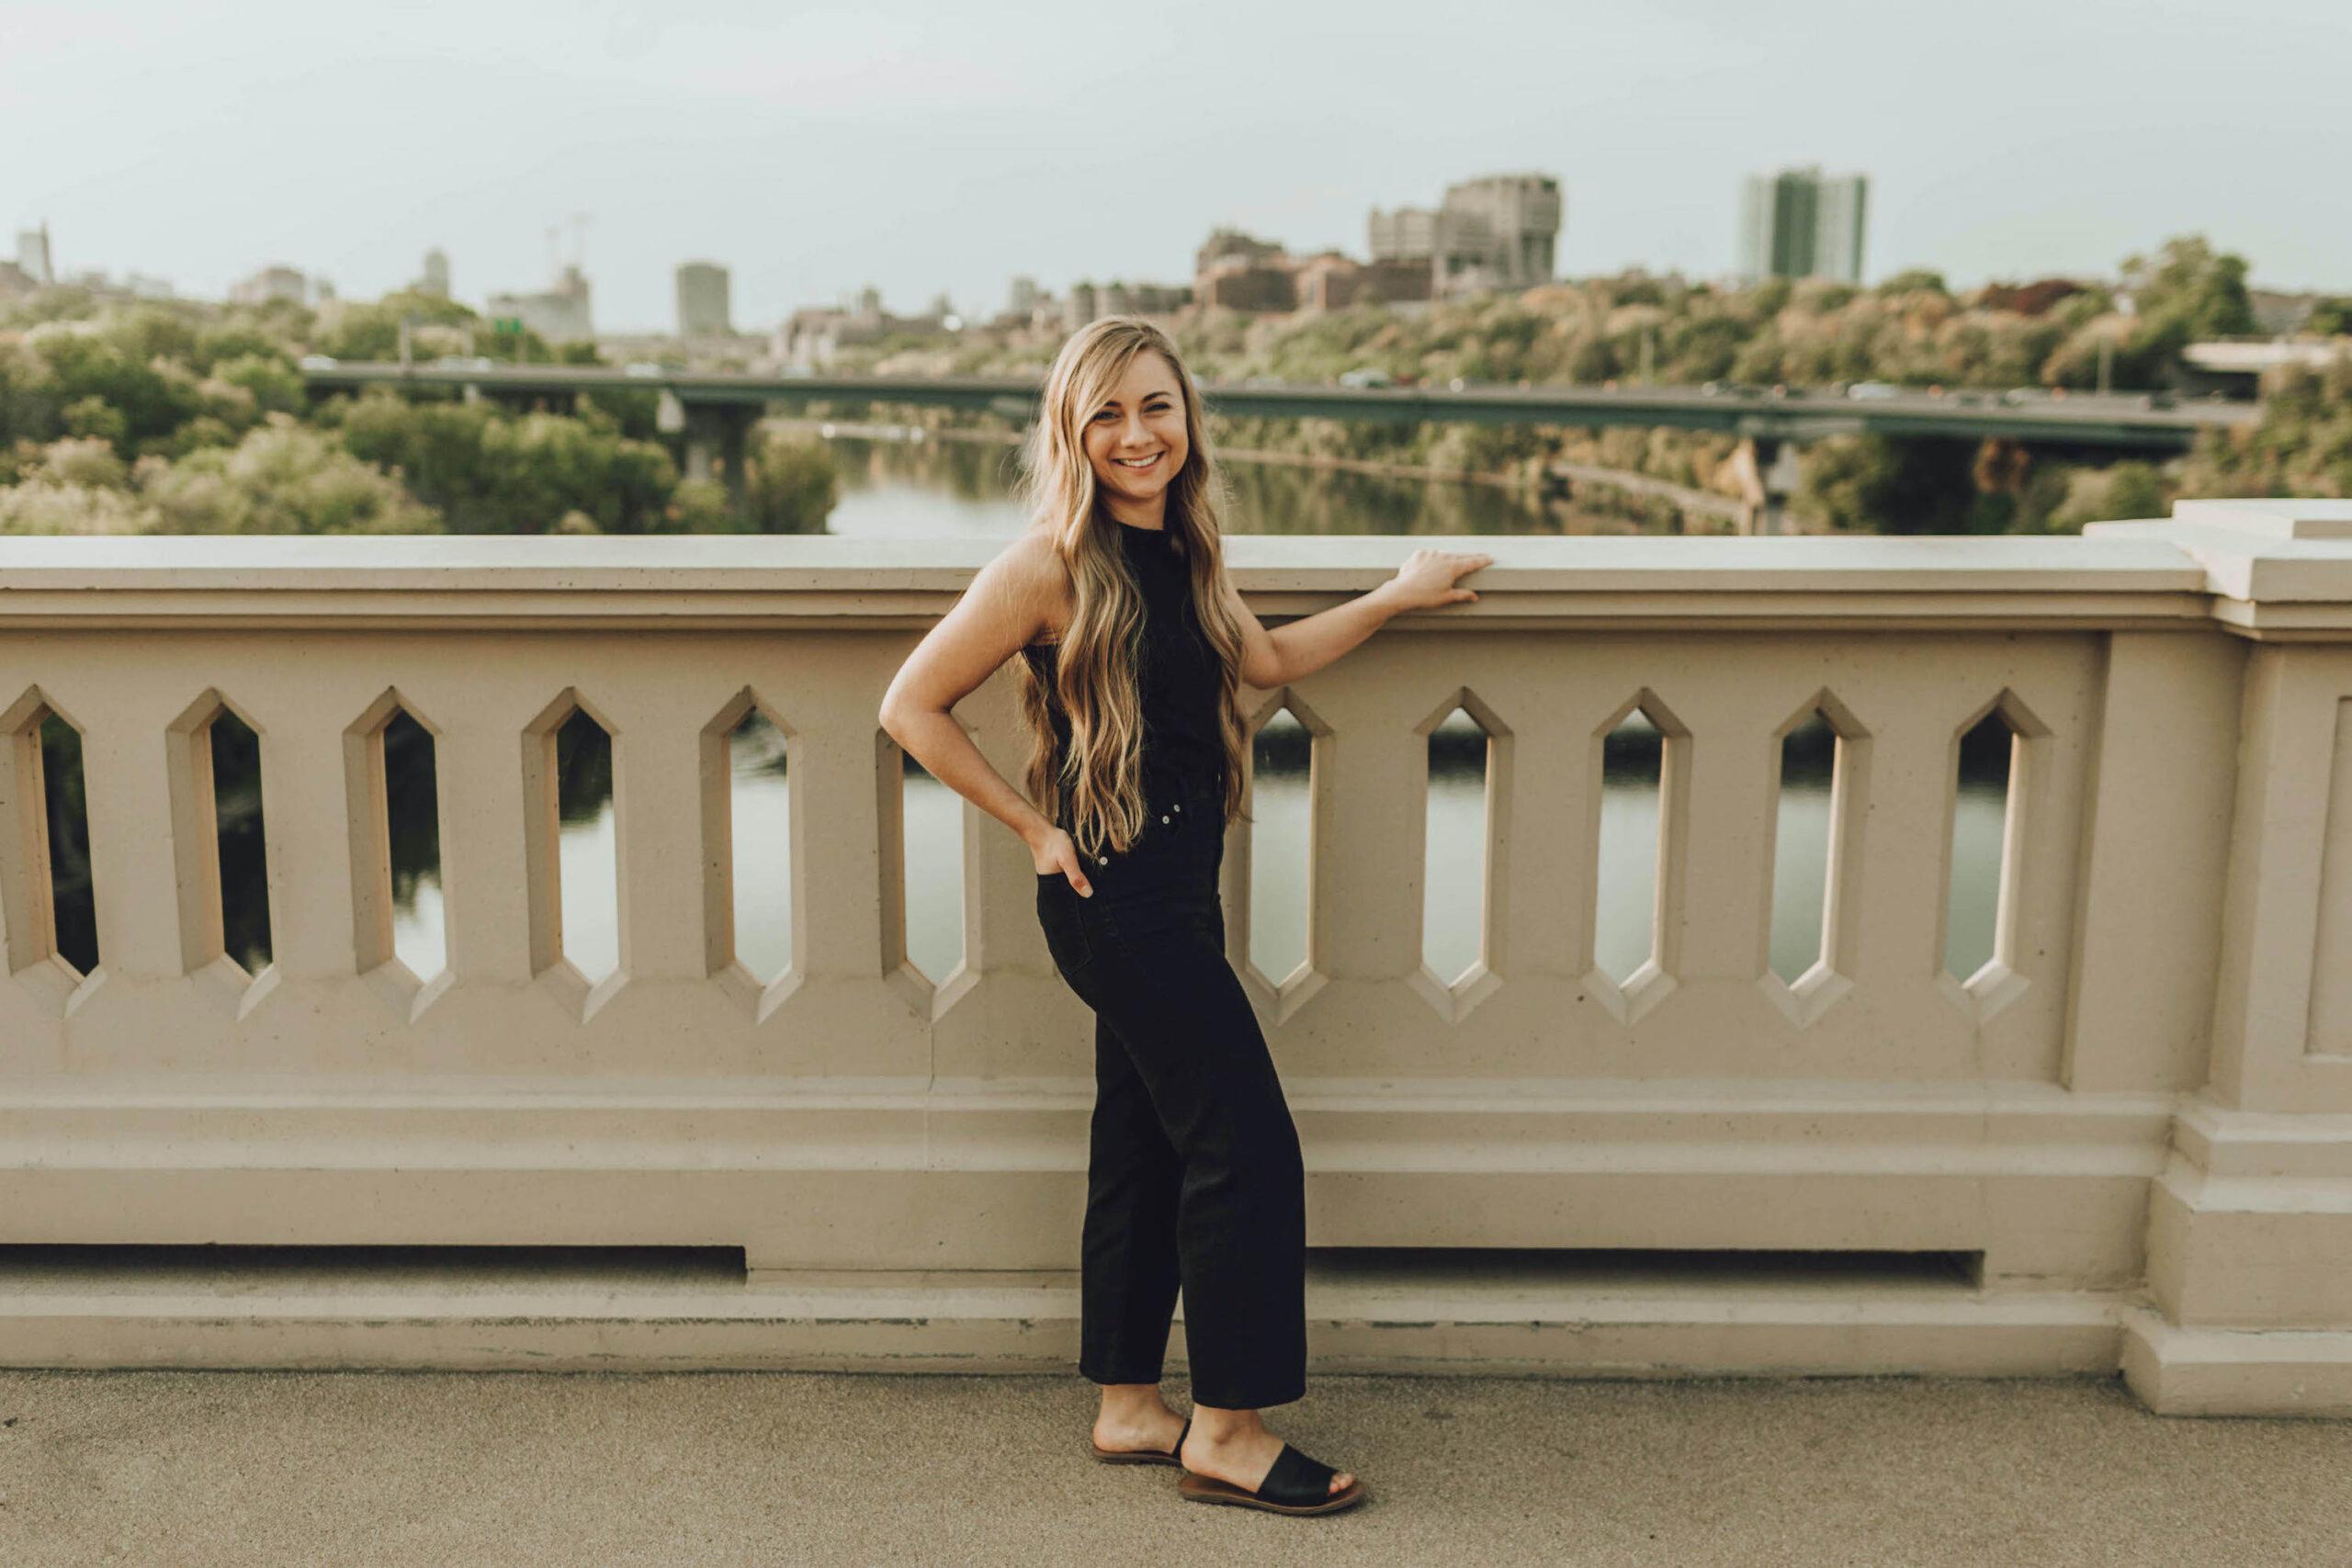 Mikaela Lauren Wellness Nutritional Therapist